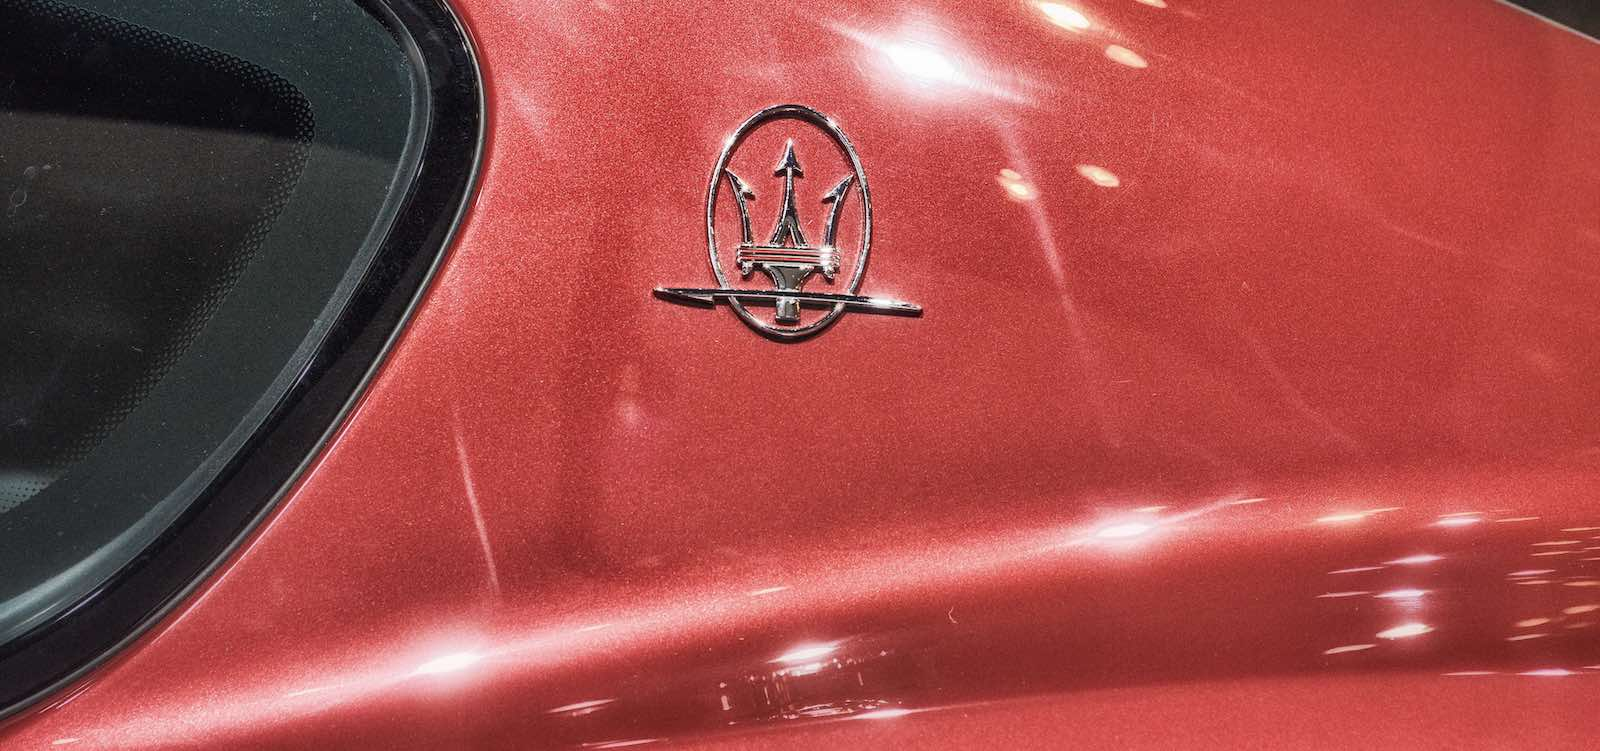 Red goes faster (Photo: Anton Stetner/Flickr)